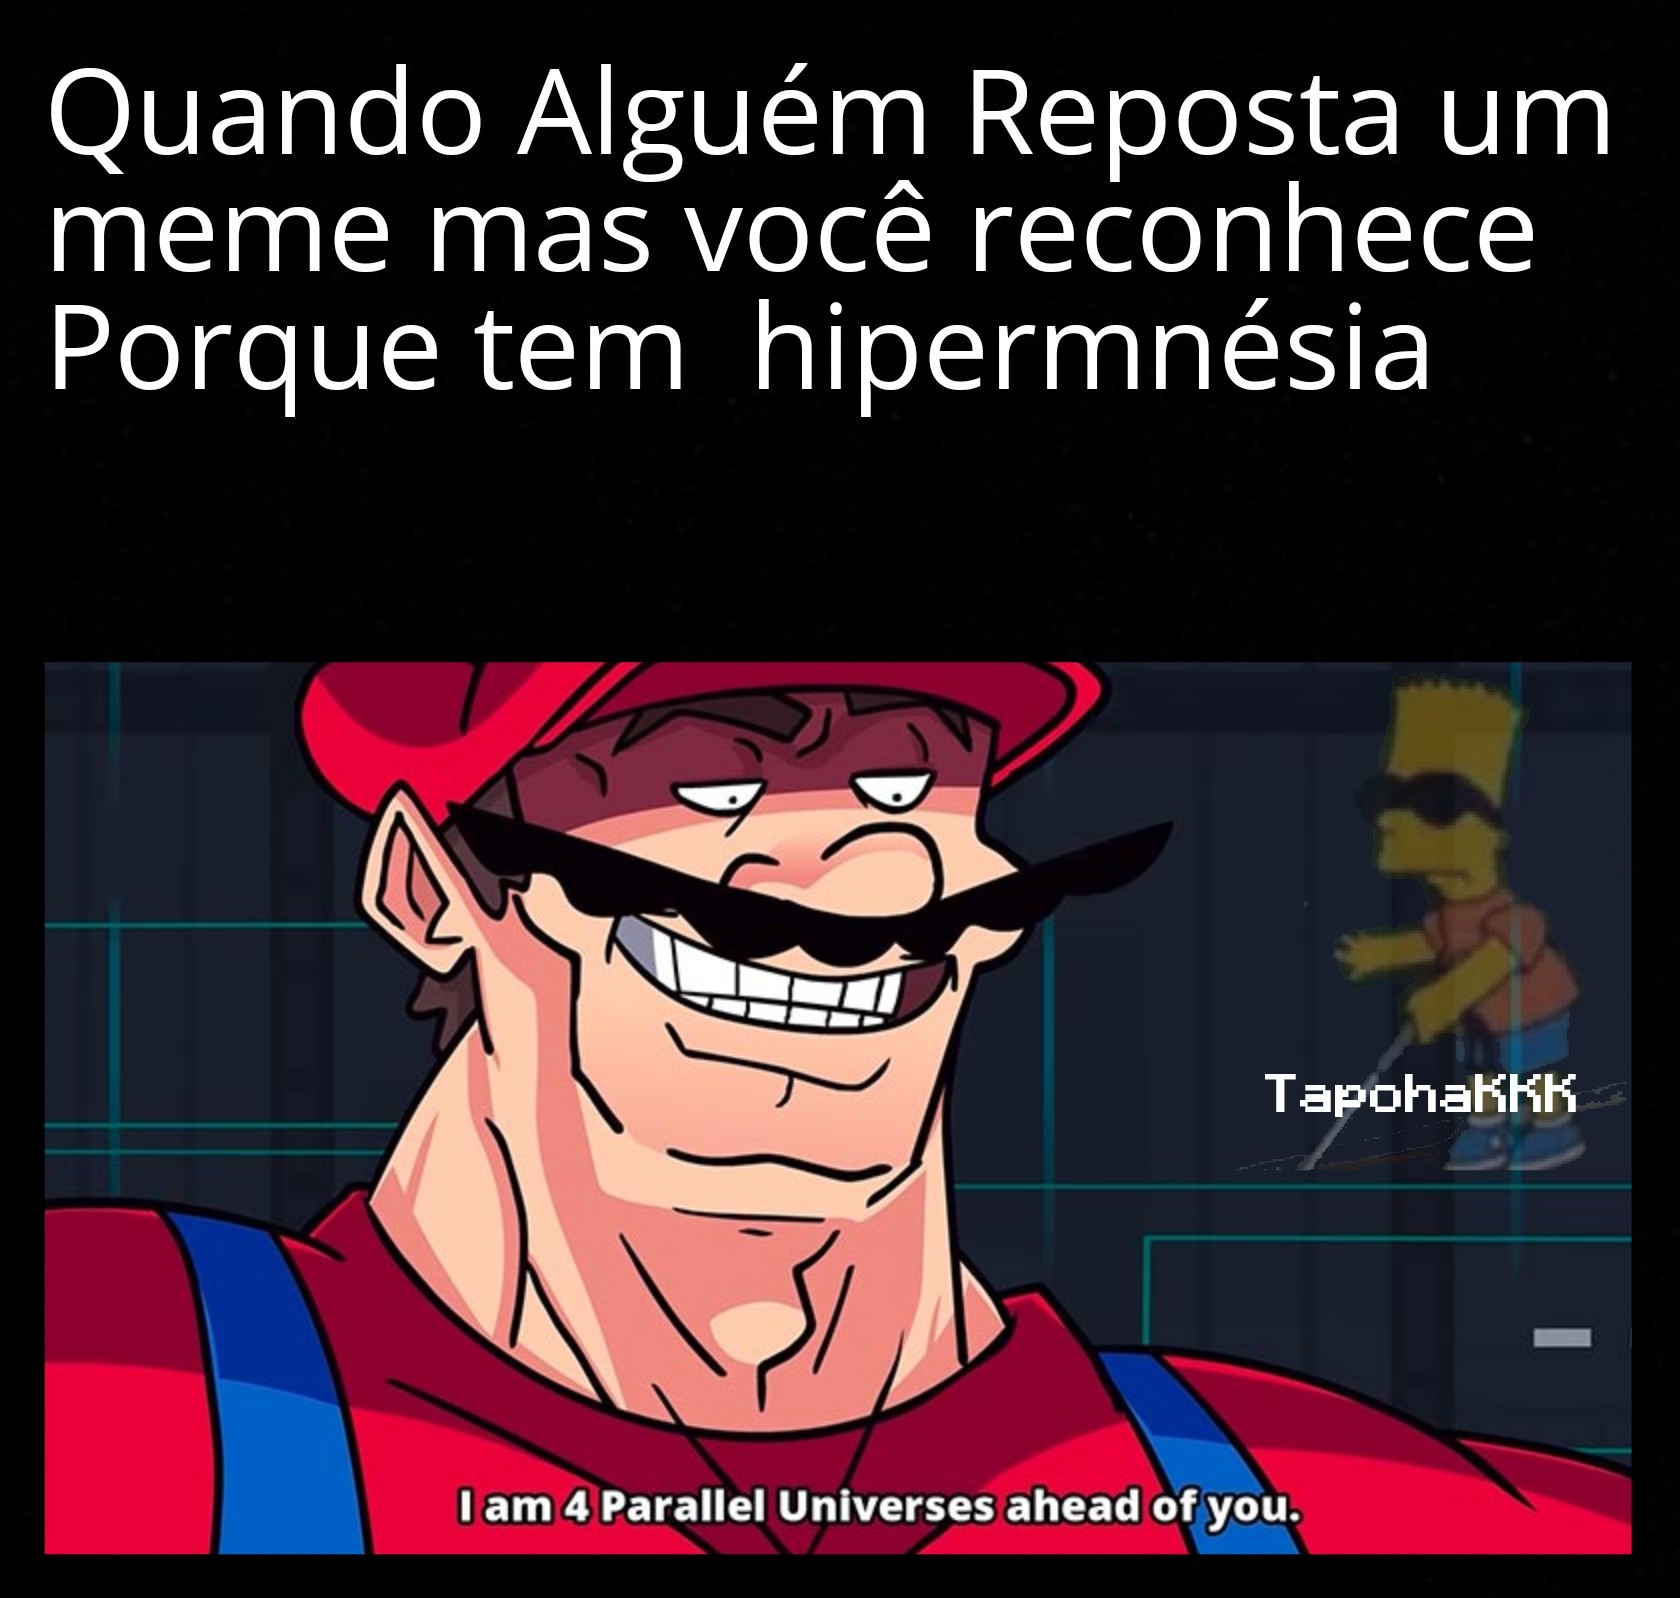 24/09/2020 - meme